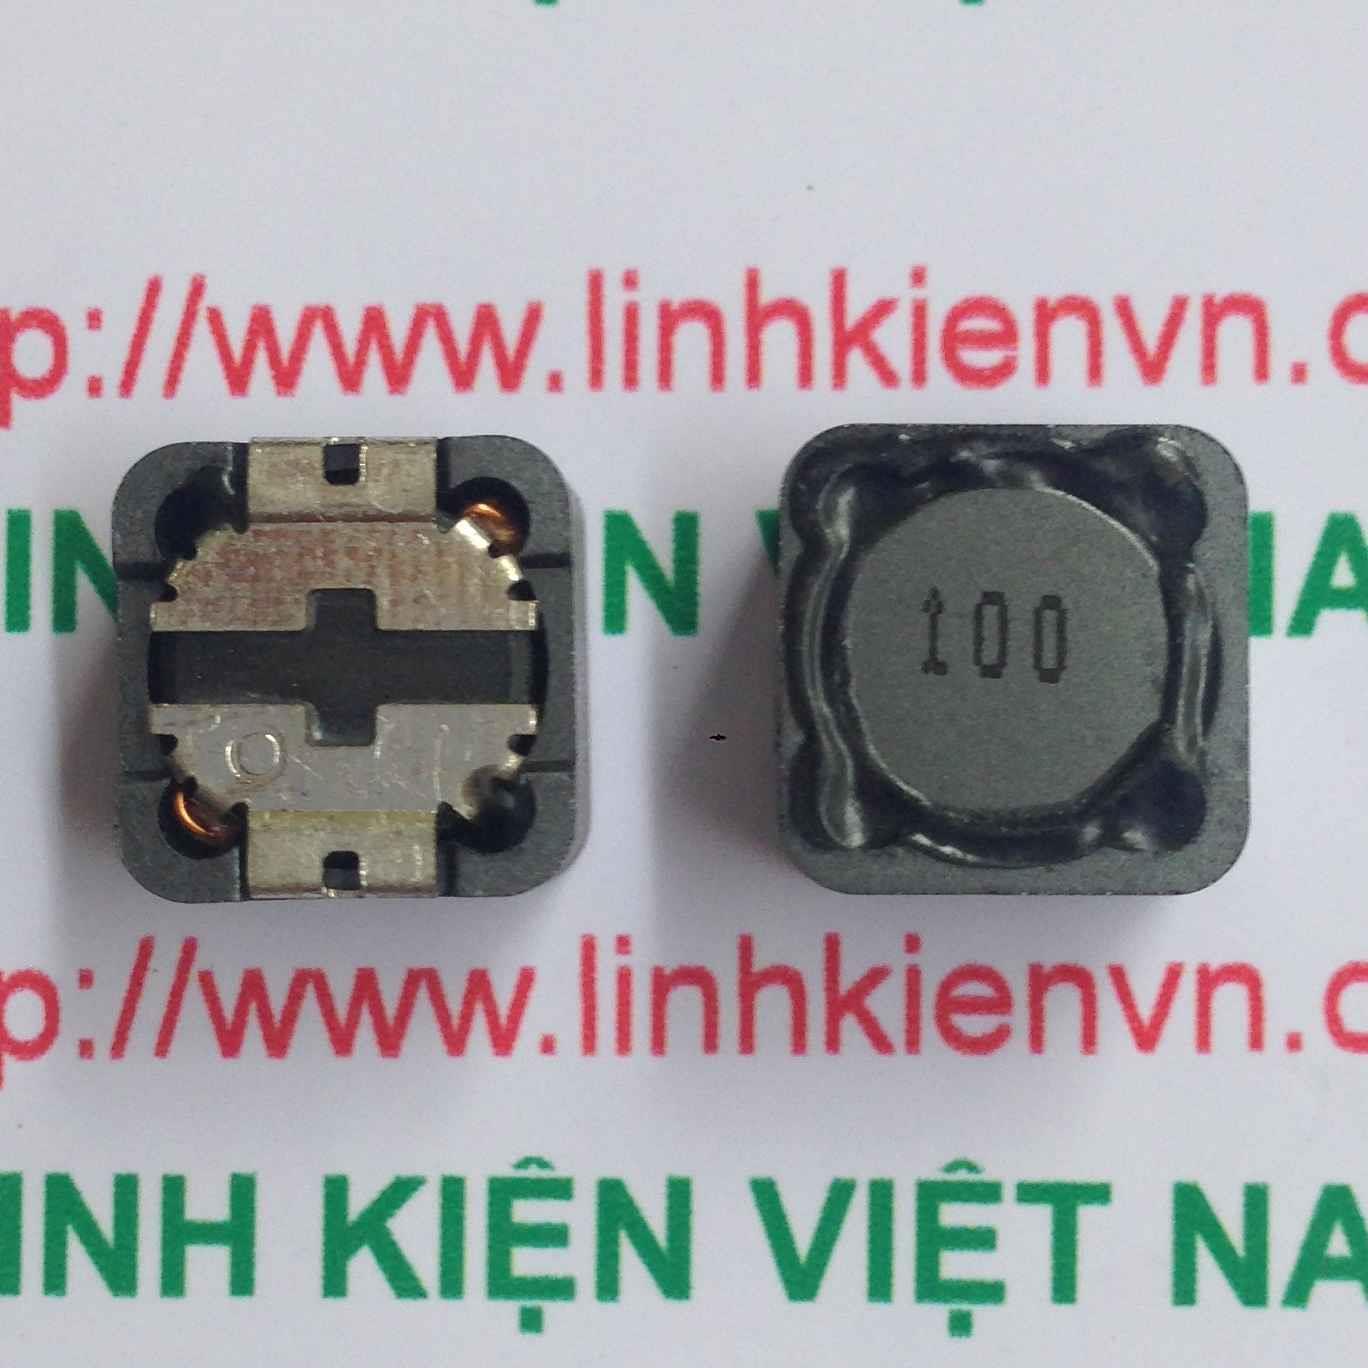 CUỘN CẢM DÁN 12x12x7mm 3A - 330uH - C10H18